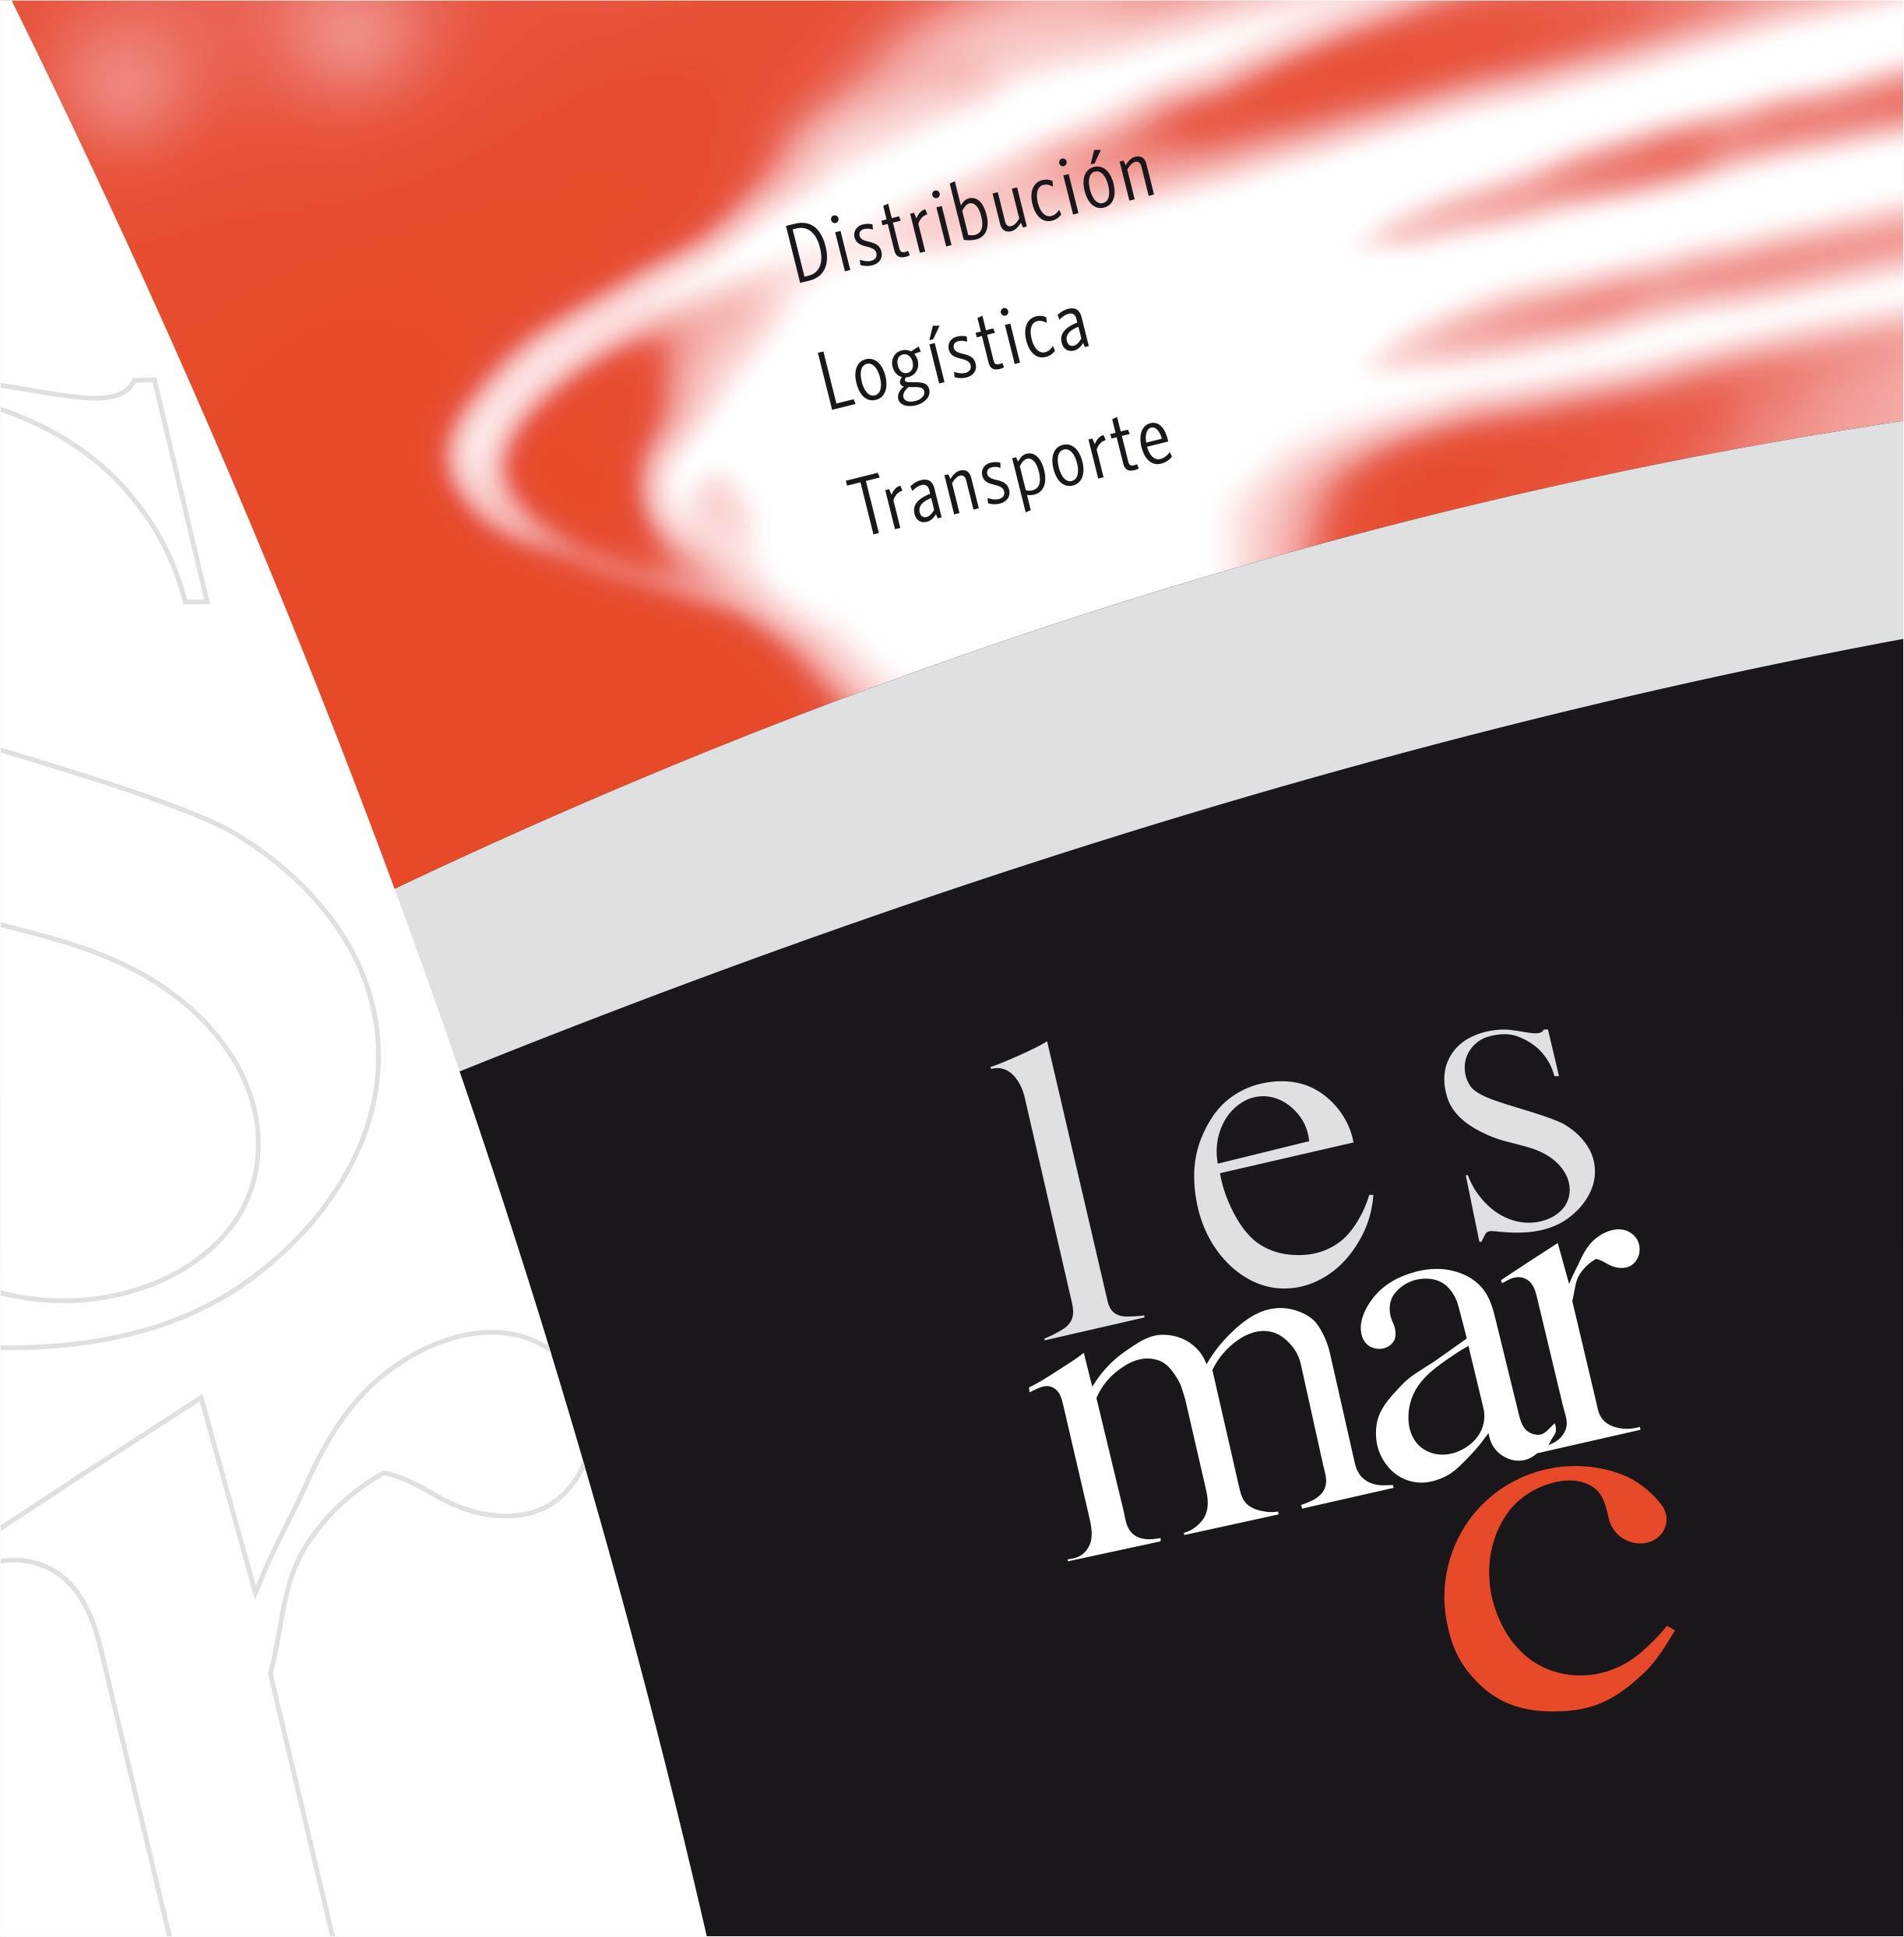 Lesmarc. Display